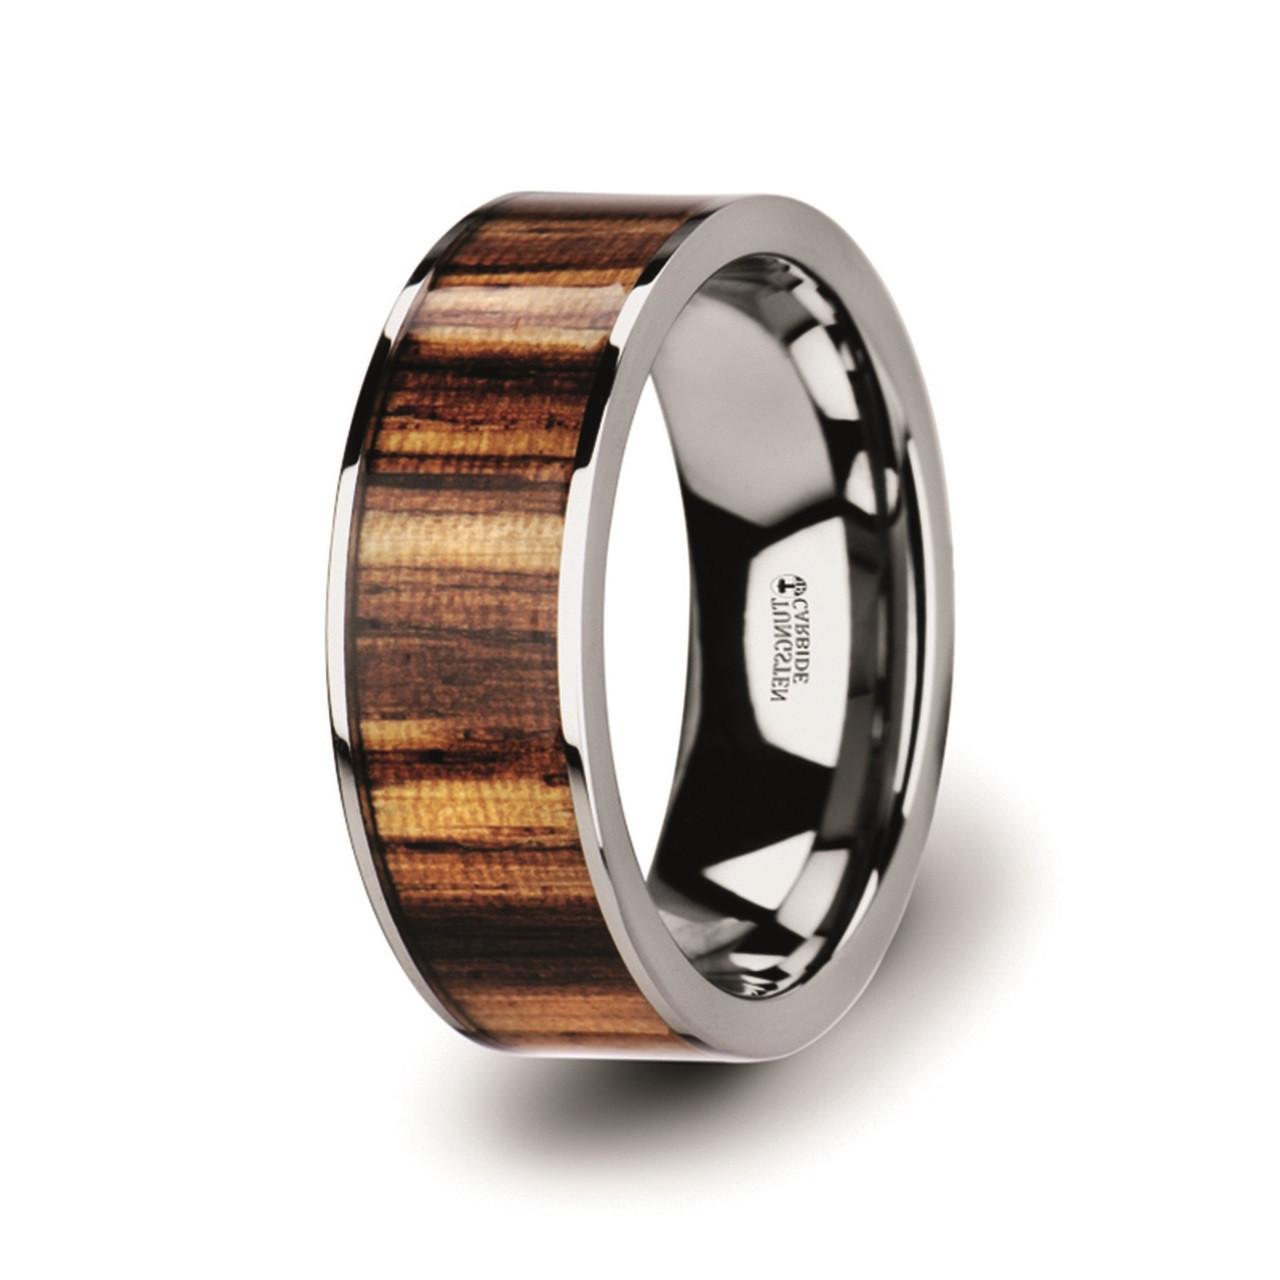 Womens /& Mens Wedding Band Men/'s wedding Ring Silver Inlay with Zebrano Wood wood wedding ring Mens Wedding Band wood ring